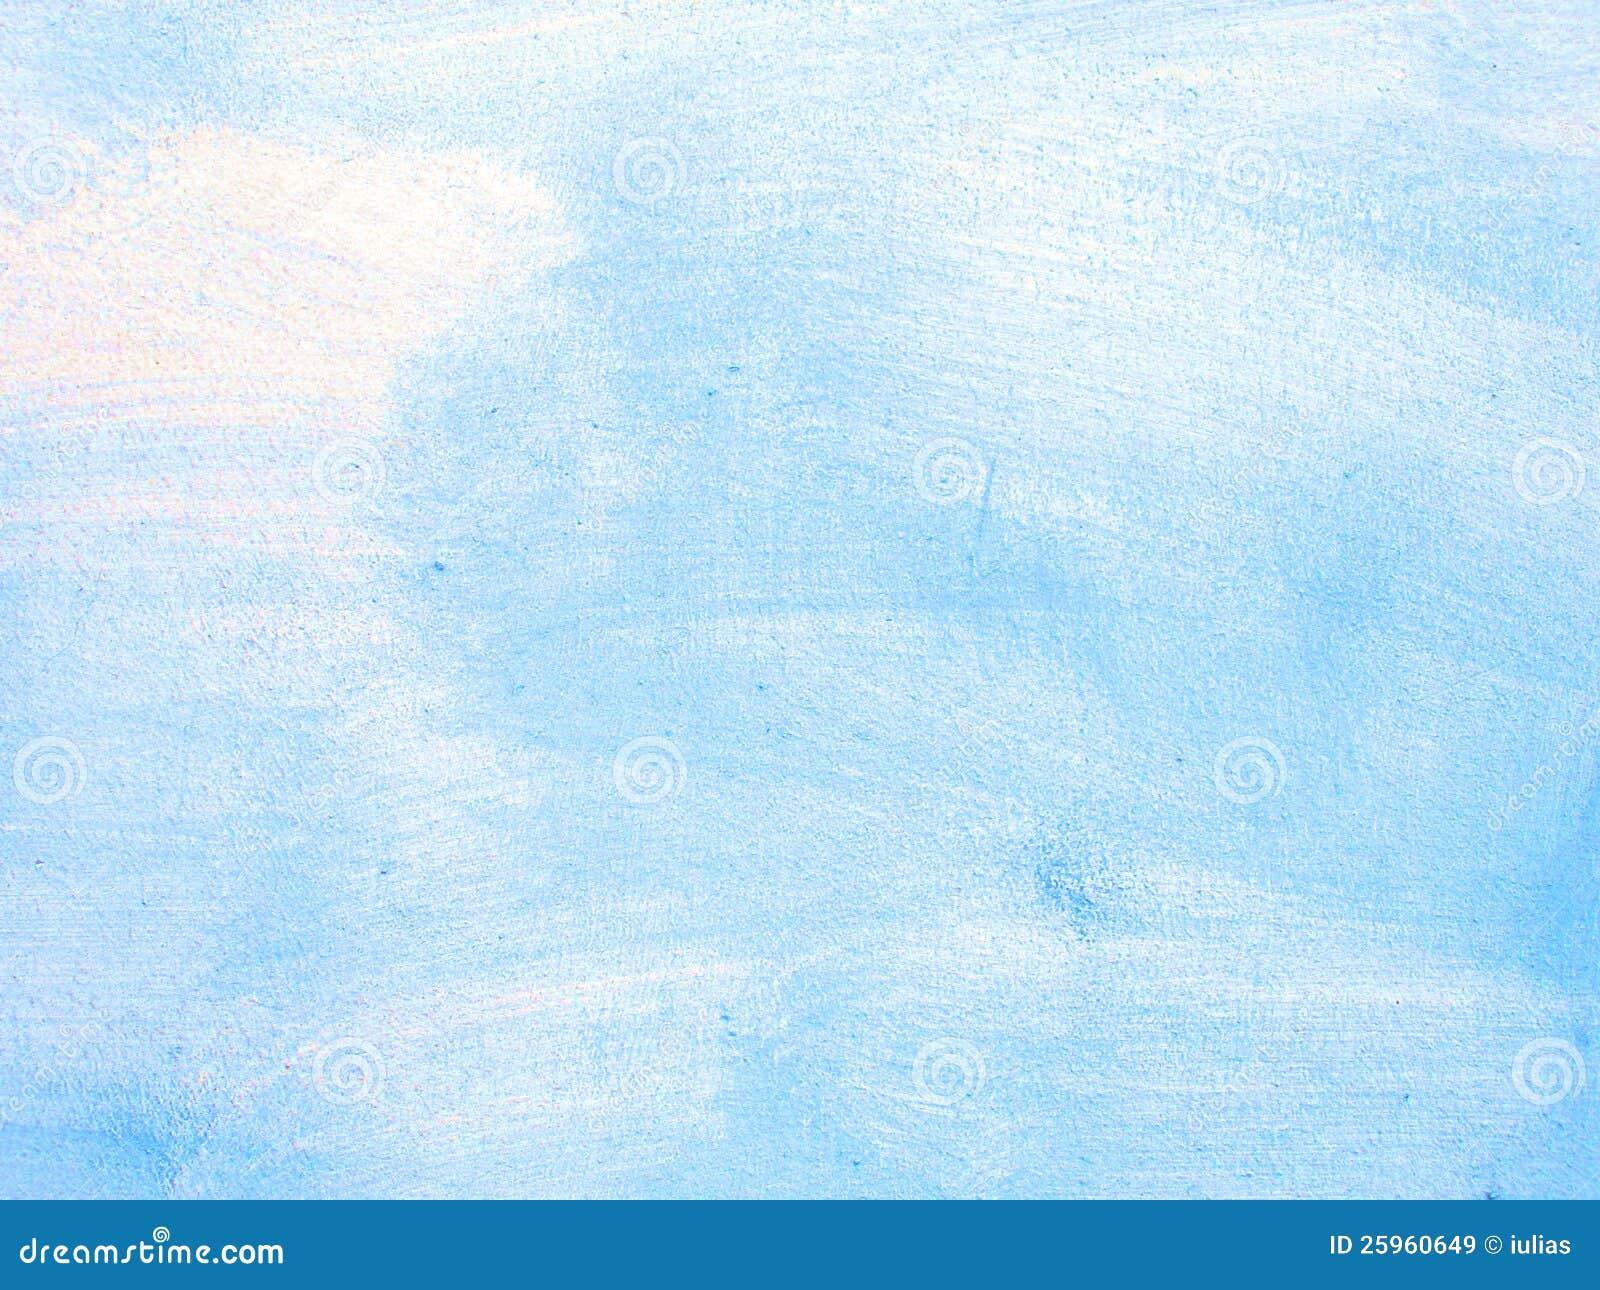 blue scratched texture wallpaper - photo #33